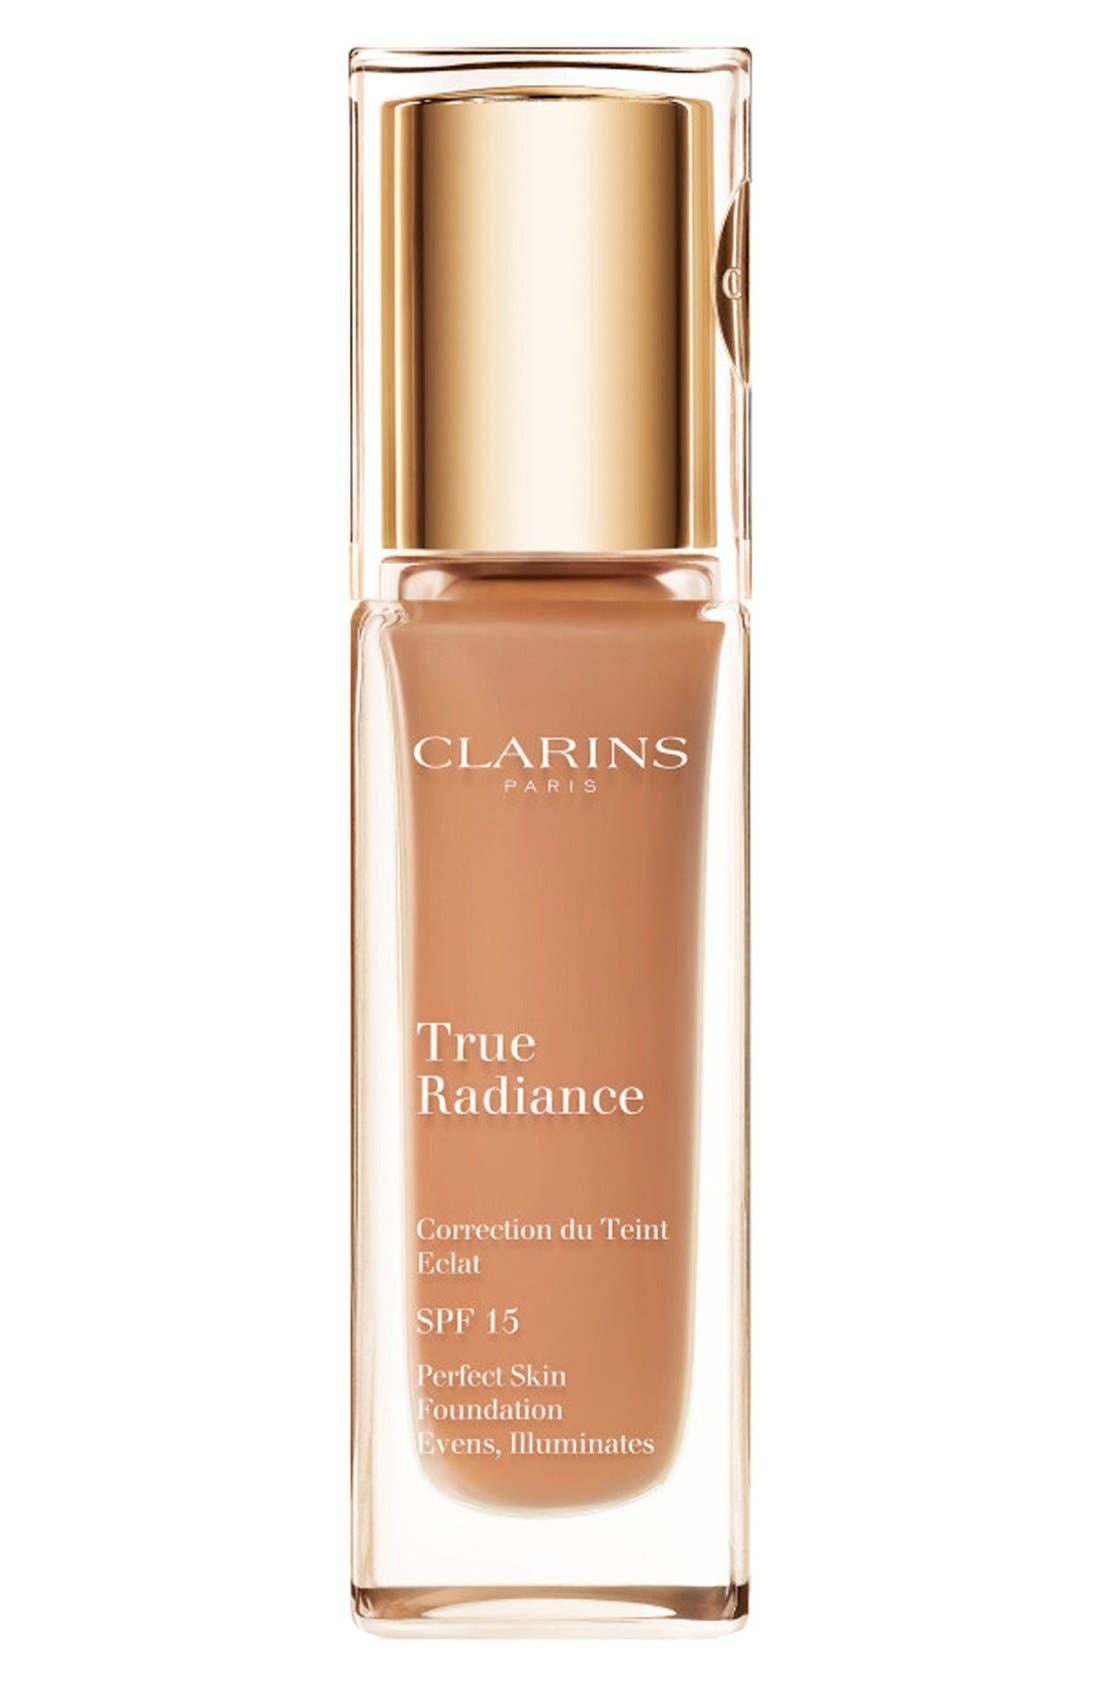 Clarins True Radiance SPF 15 Perfect Skin Foundation